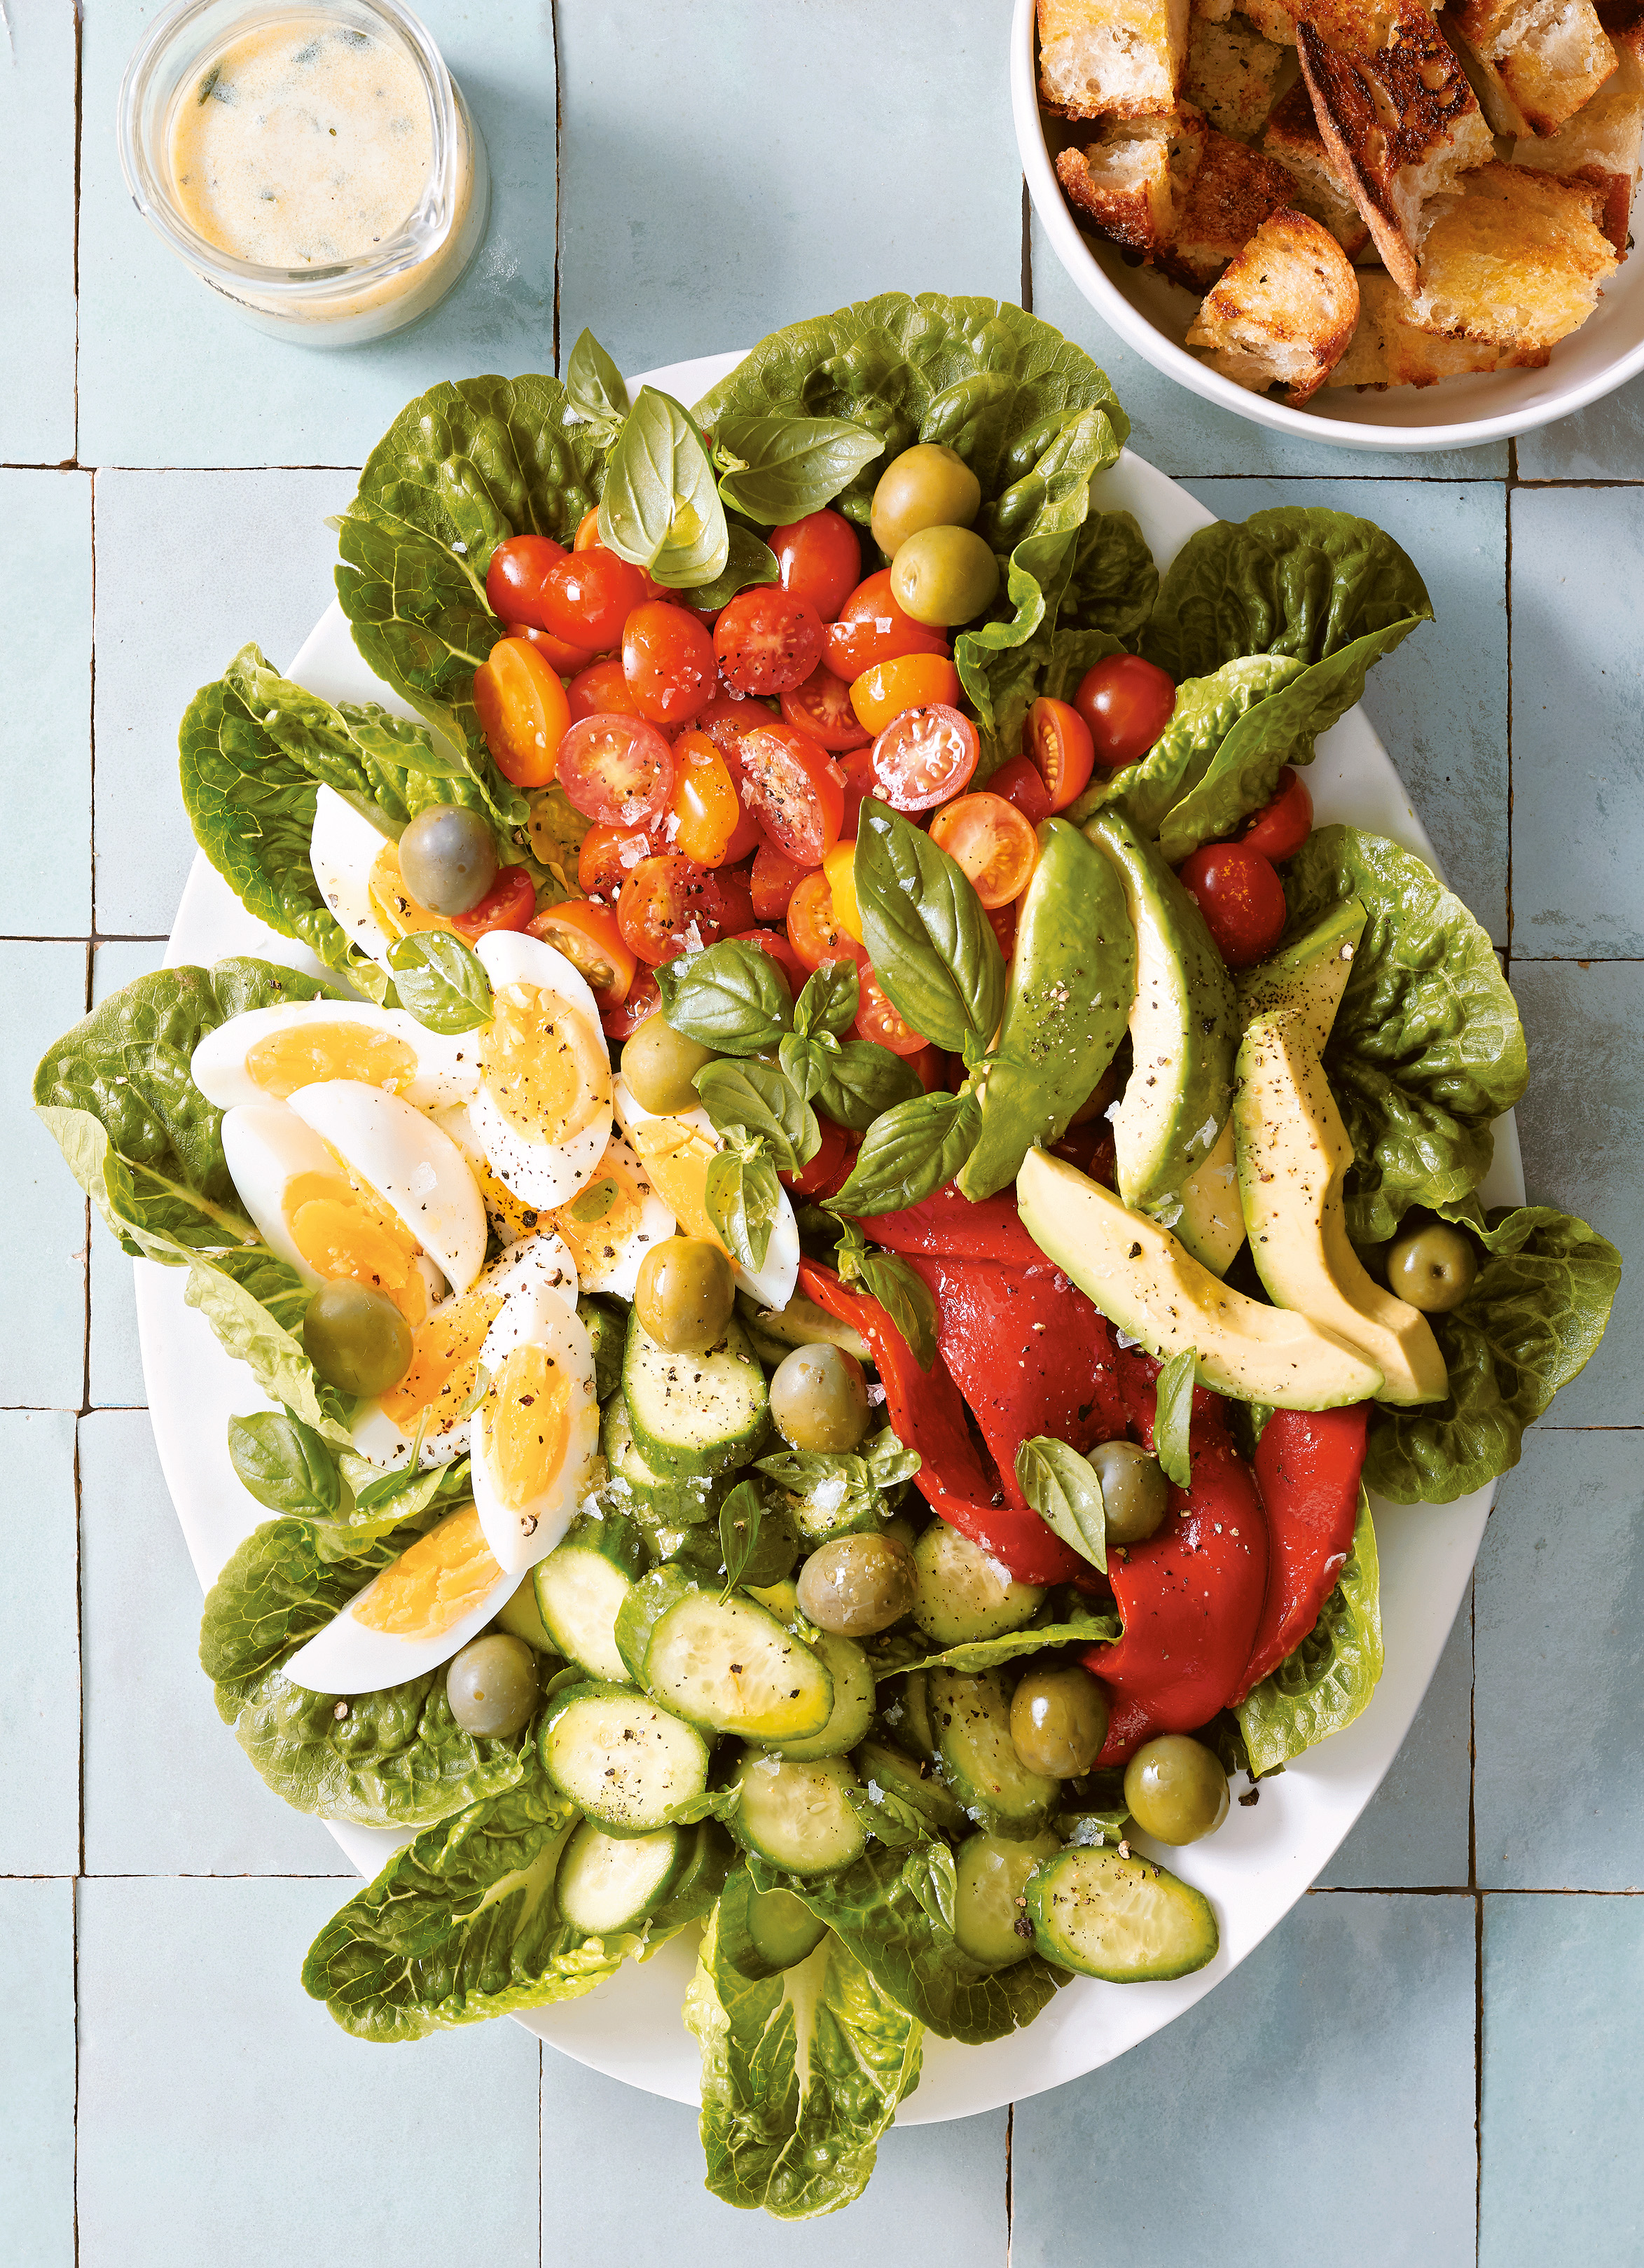 Summer-on-a-Platter Salad